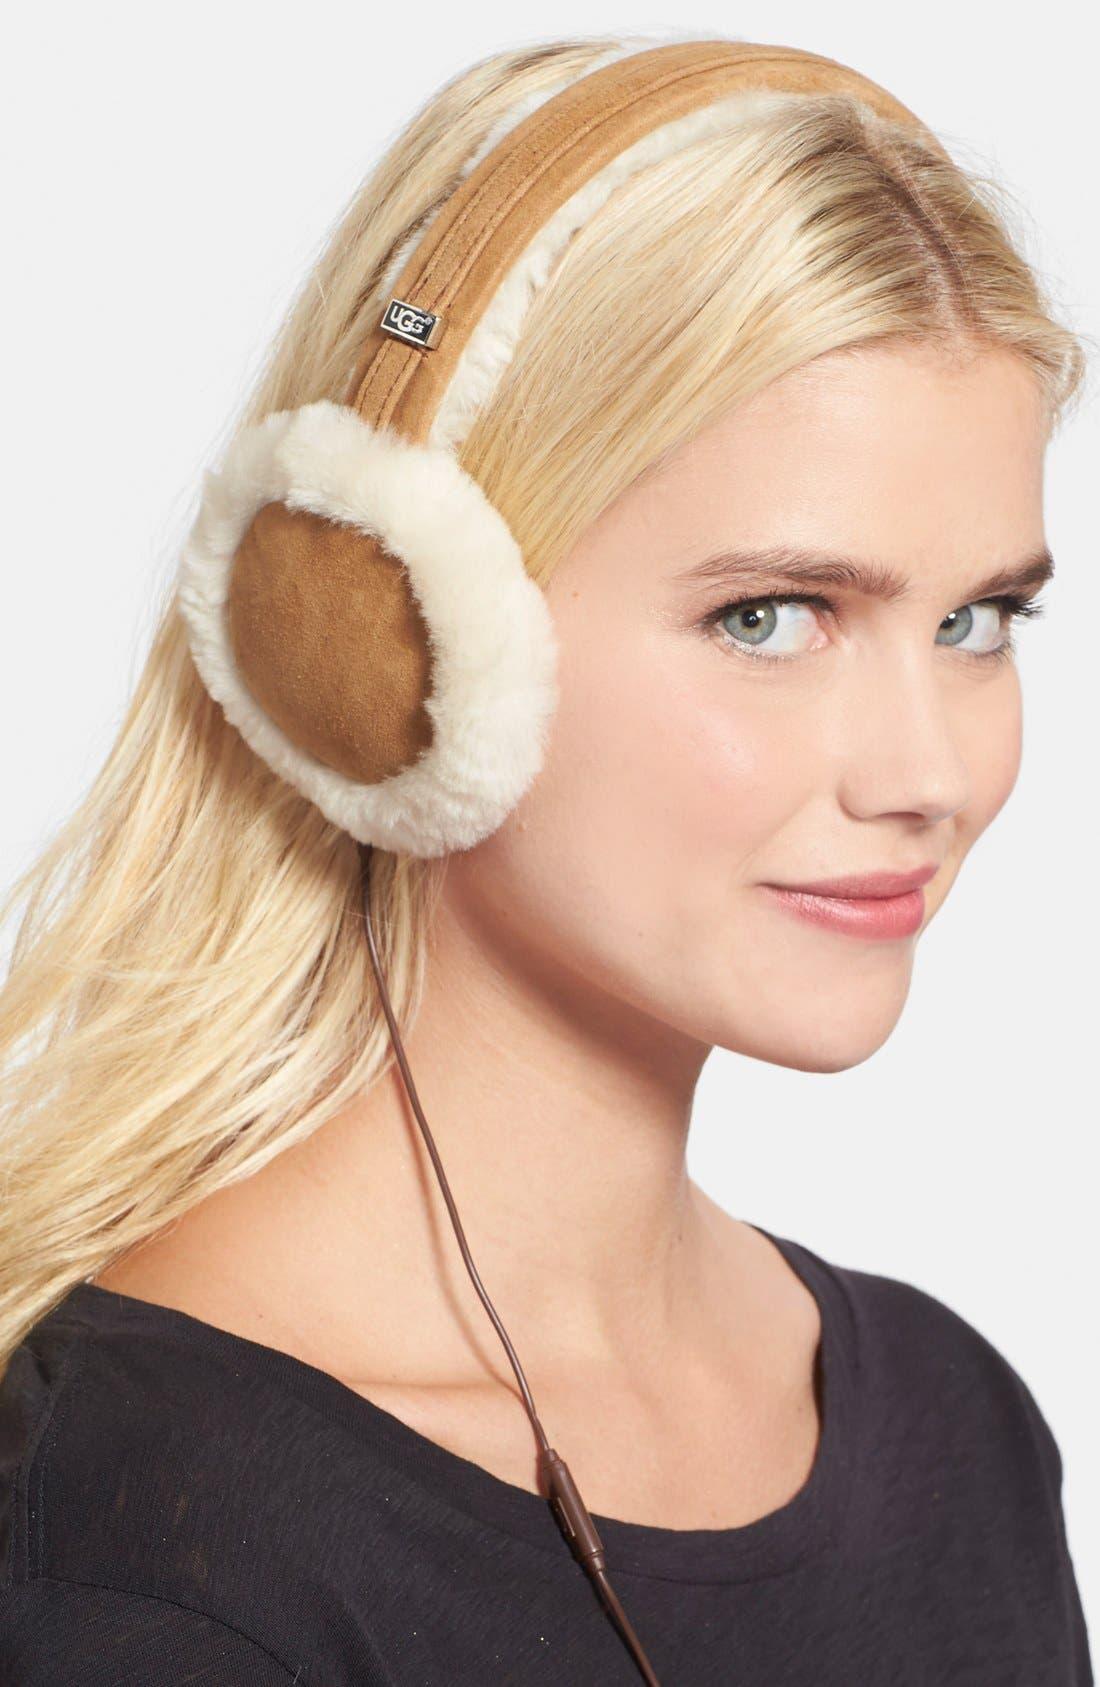 Australia 'Classic' Genuine Shearling Headphone Earmuffs,                         Main,                         color, 250